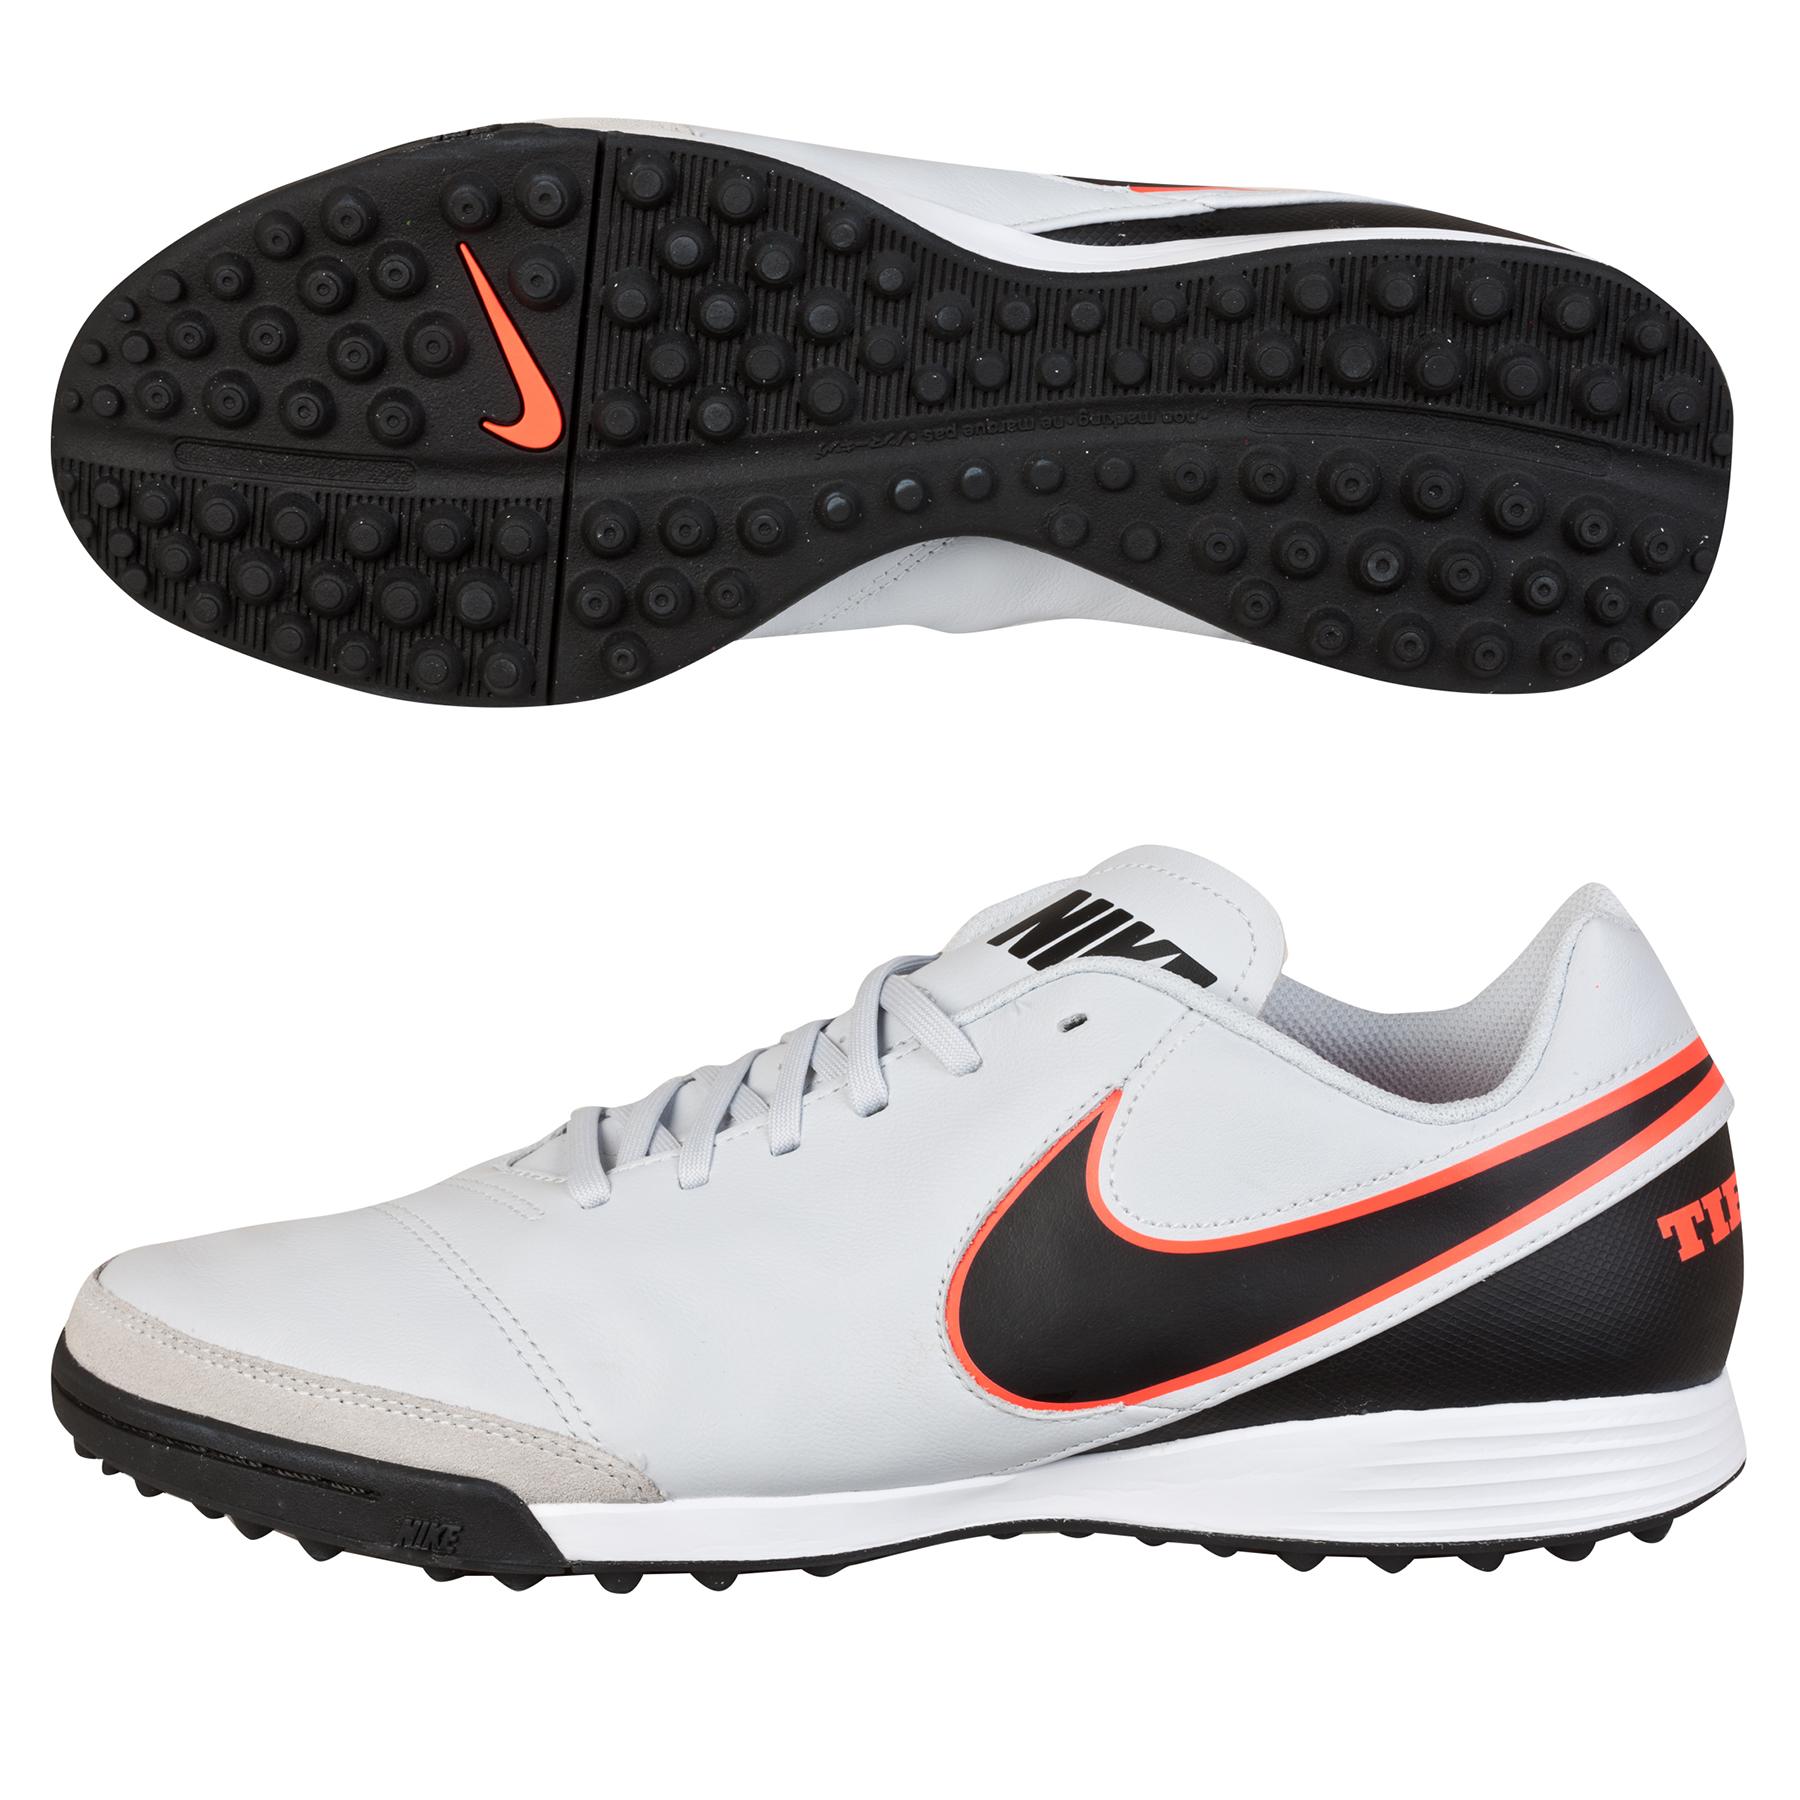 Nike Tiempo Genio II Leather Astroturf Trainers Grey